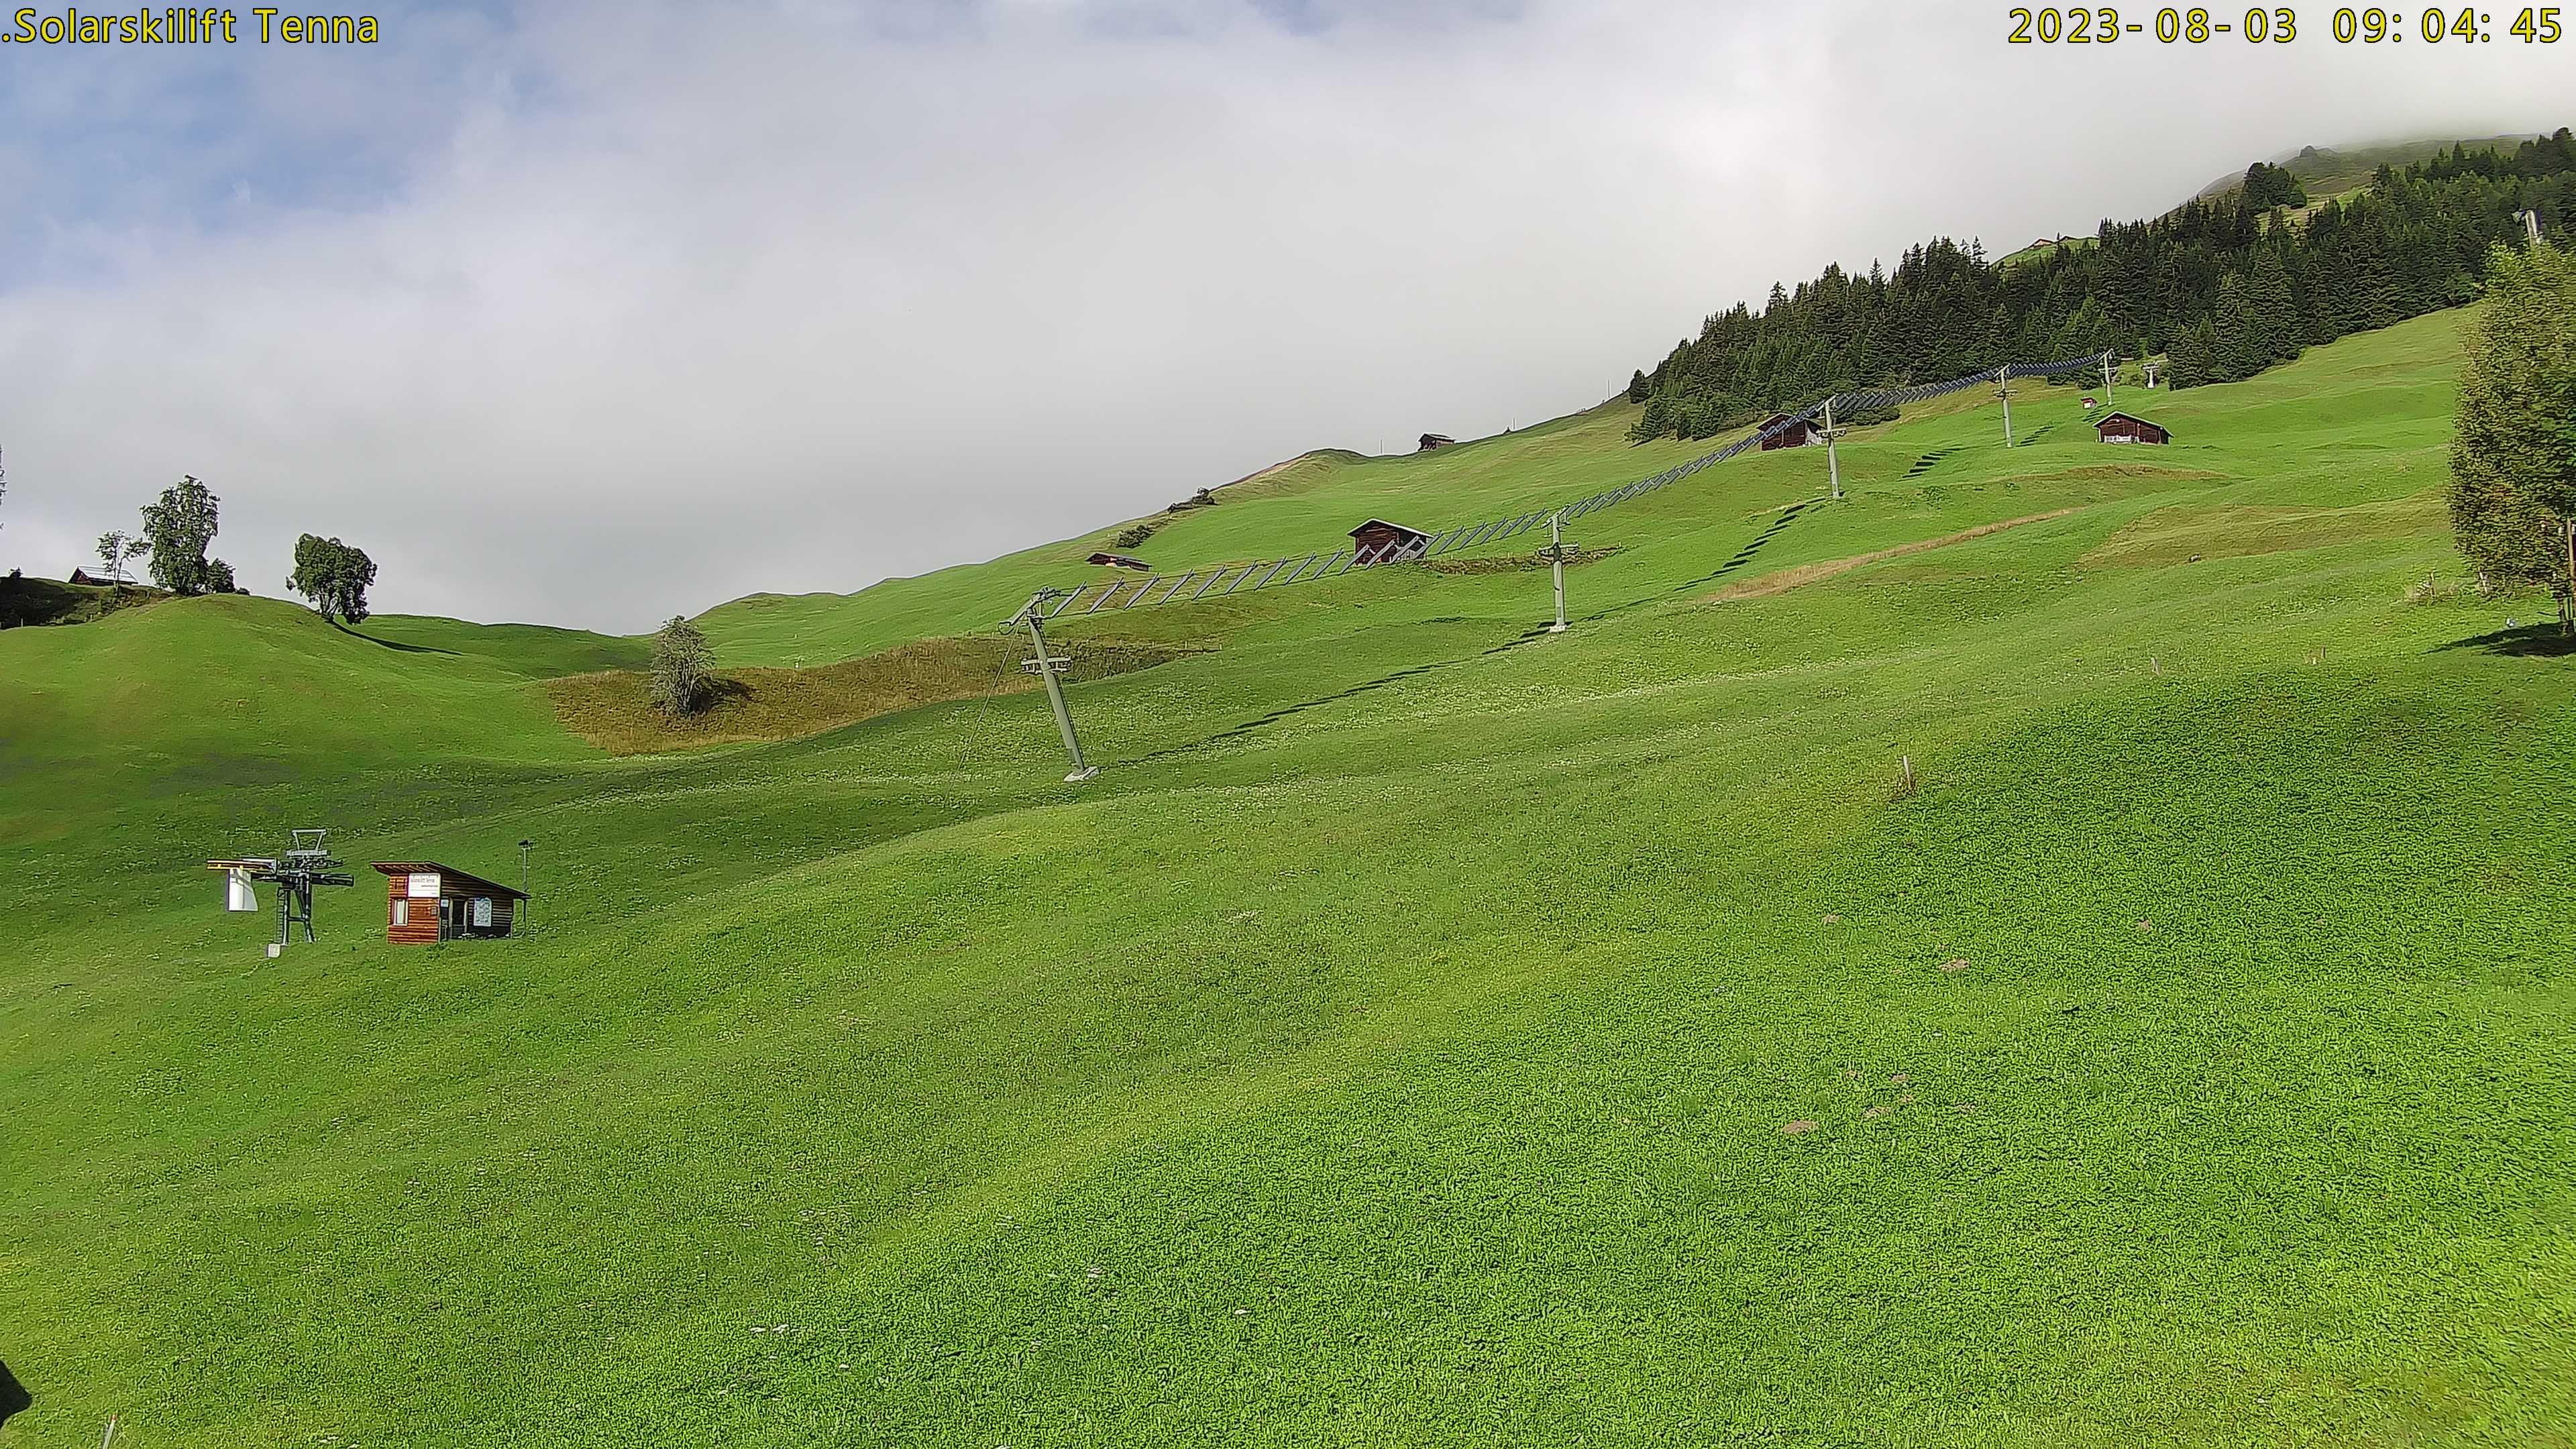 Webcam Solarskilift Tenna